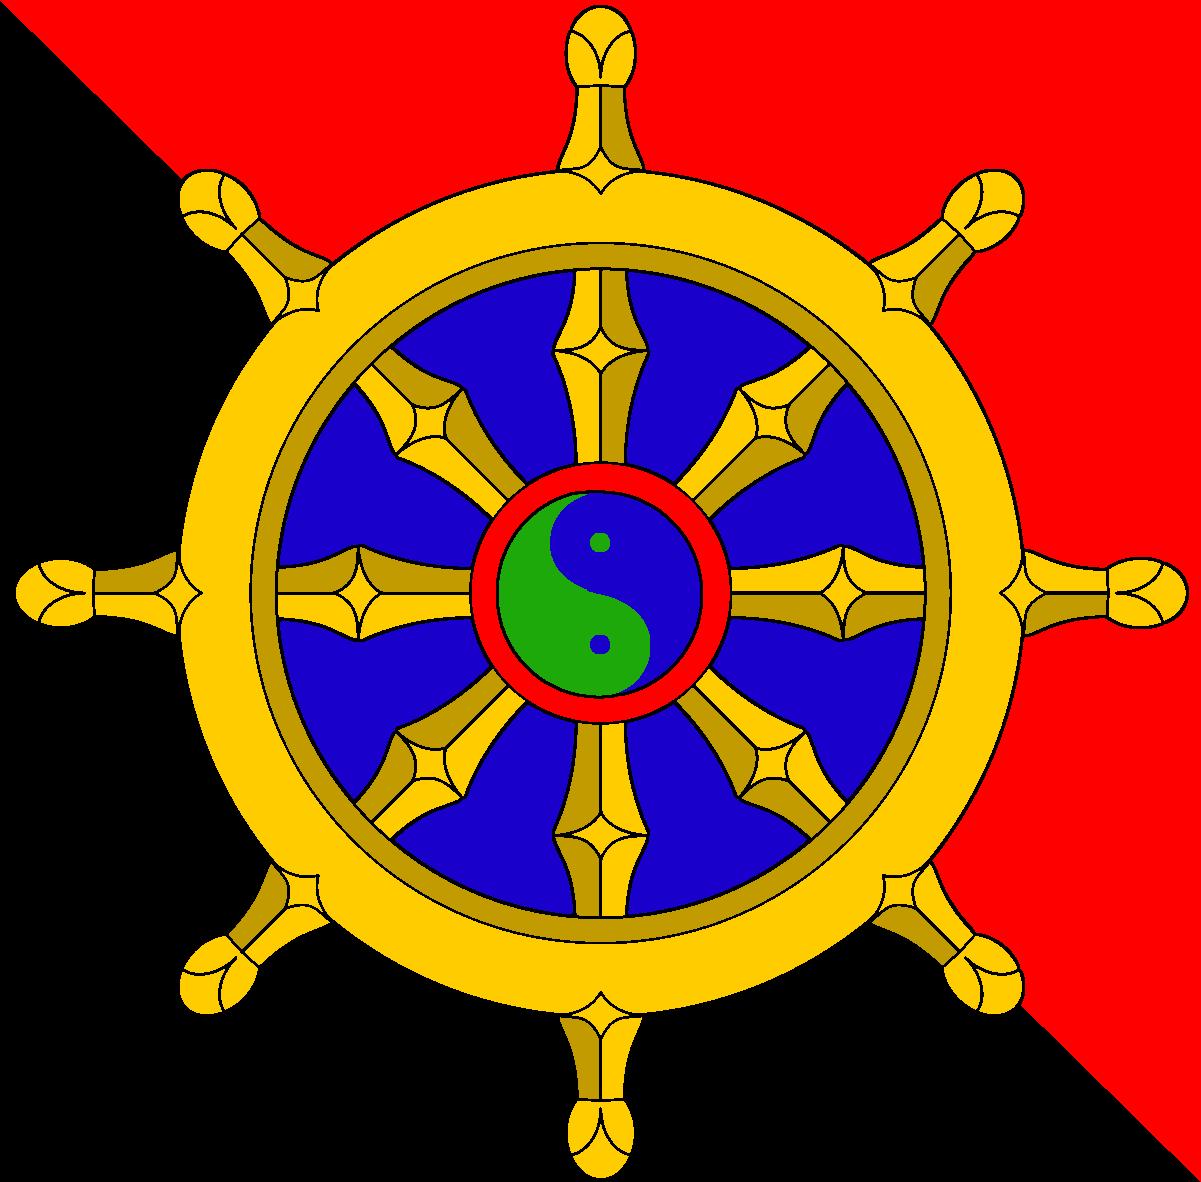 BuddhistFlag3.png